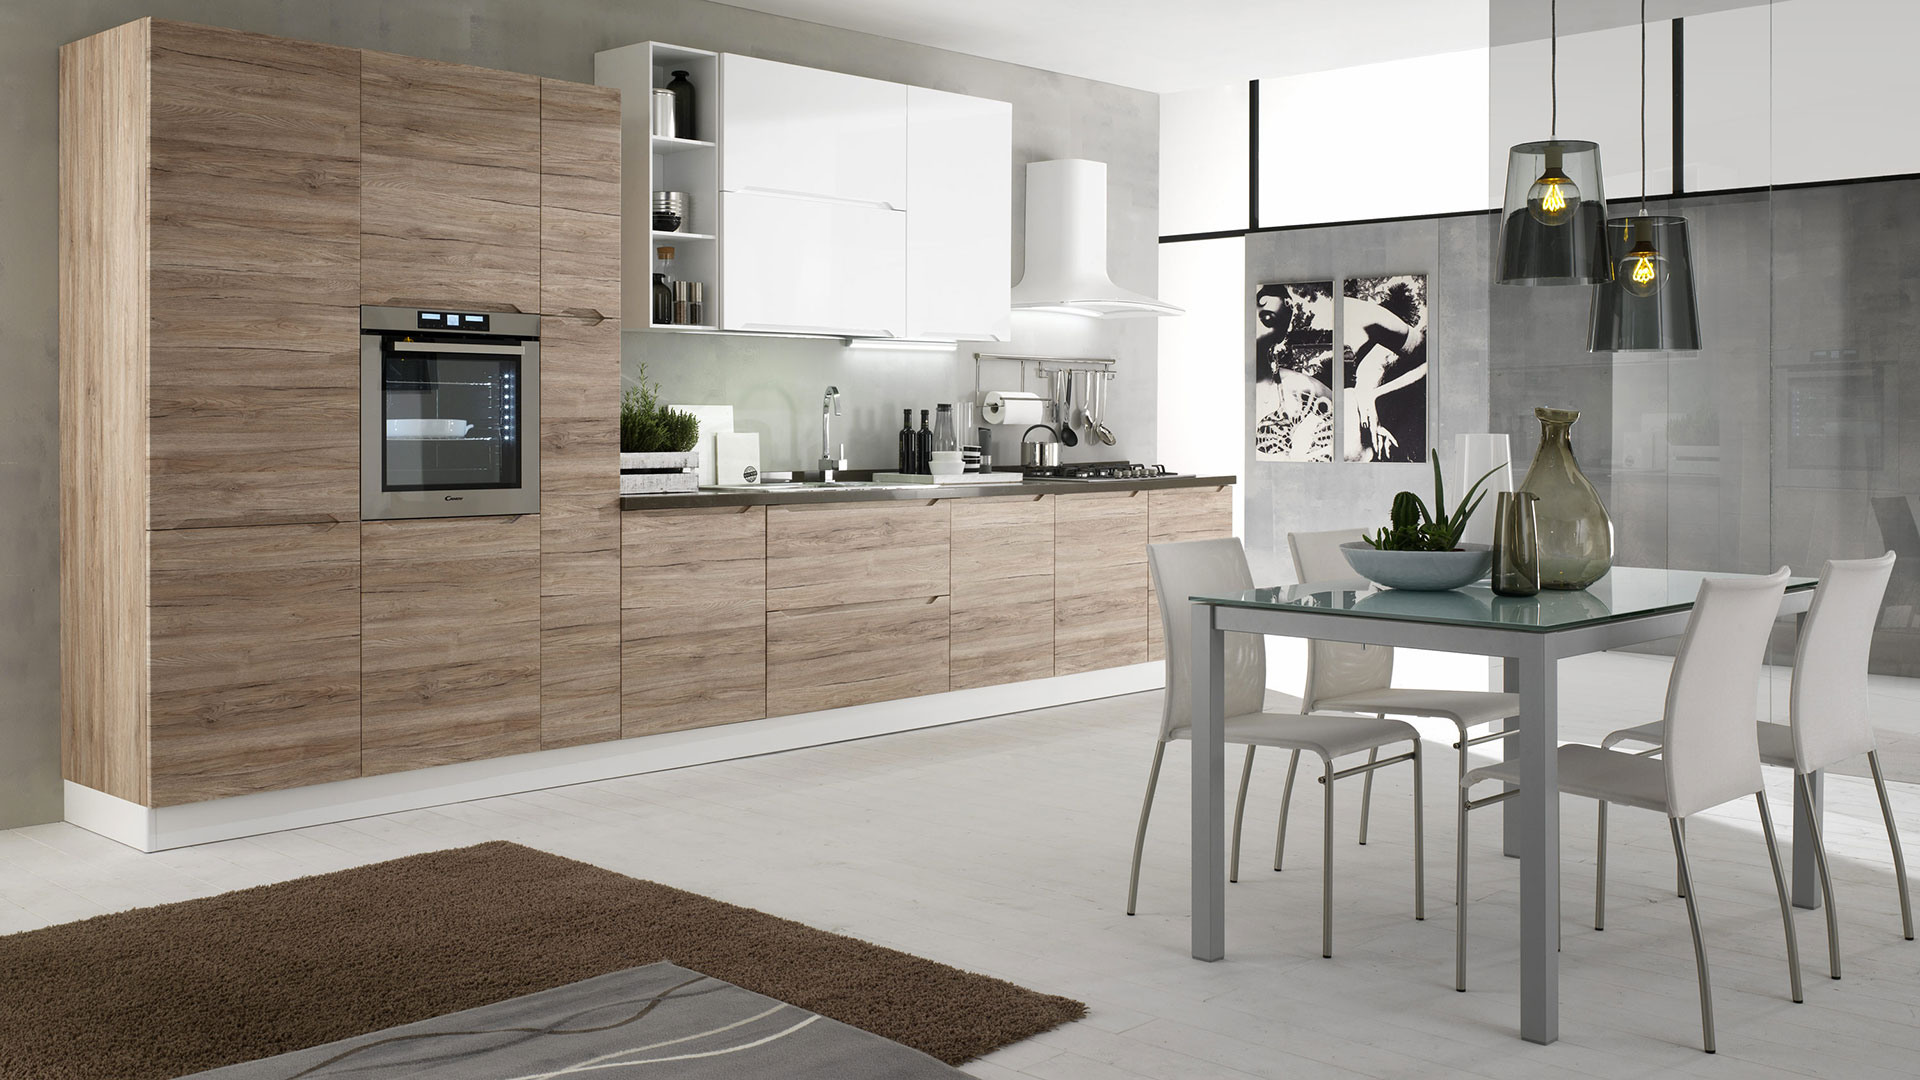 Evo cucine classiche e moderne made in italy sito ufficiale - Immagini di tende per cucina ...